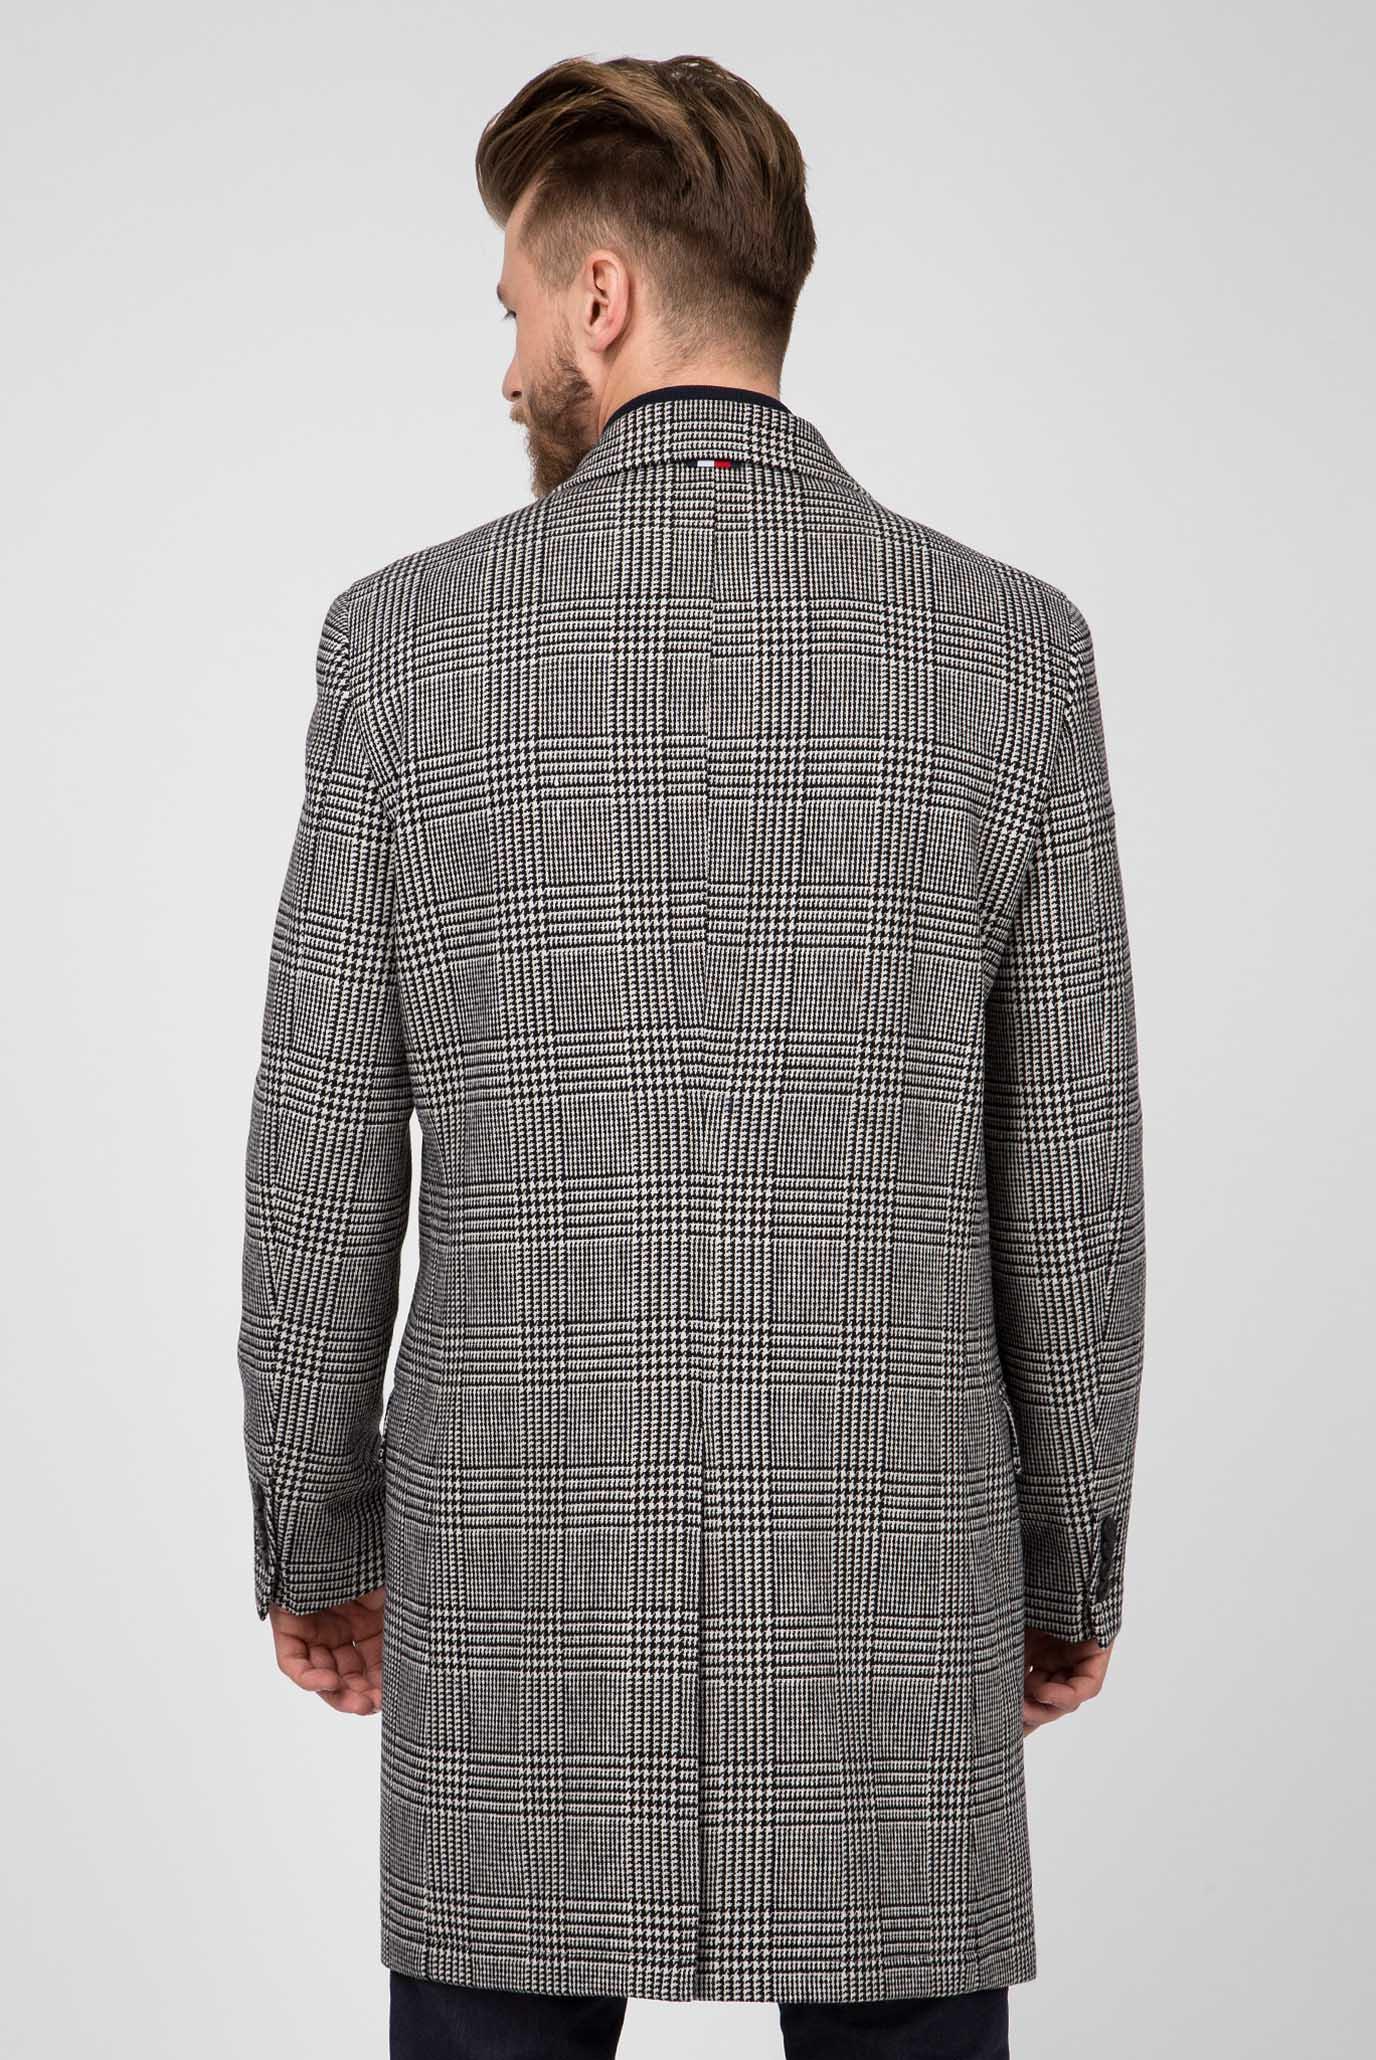 Купить Мужское пальто в клетку WOOL CHECK SINGLE BREASTED Tommy Hilfiger Tommy Hilfiger MW0MW08230 – Киев, Украина. Цены в интернет магазине MD Fashion